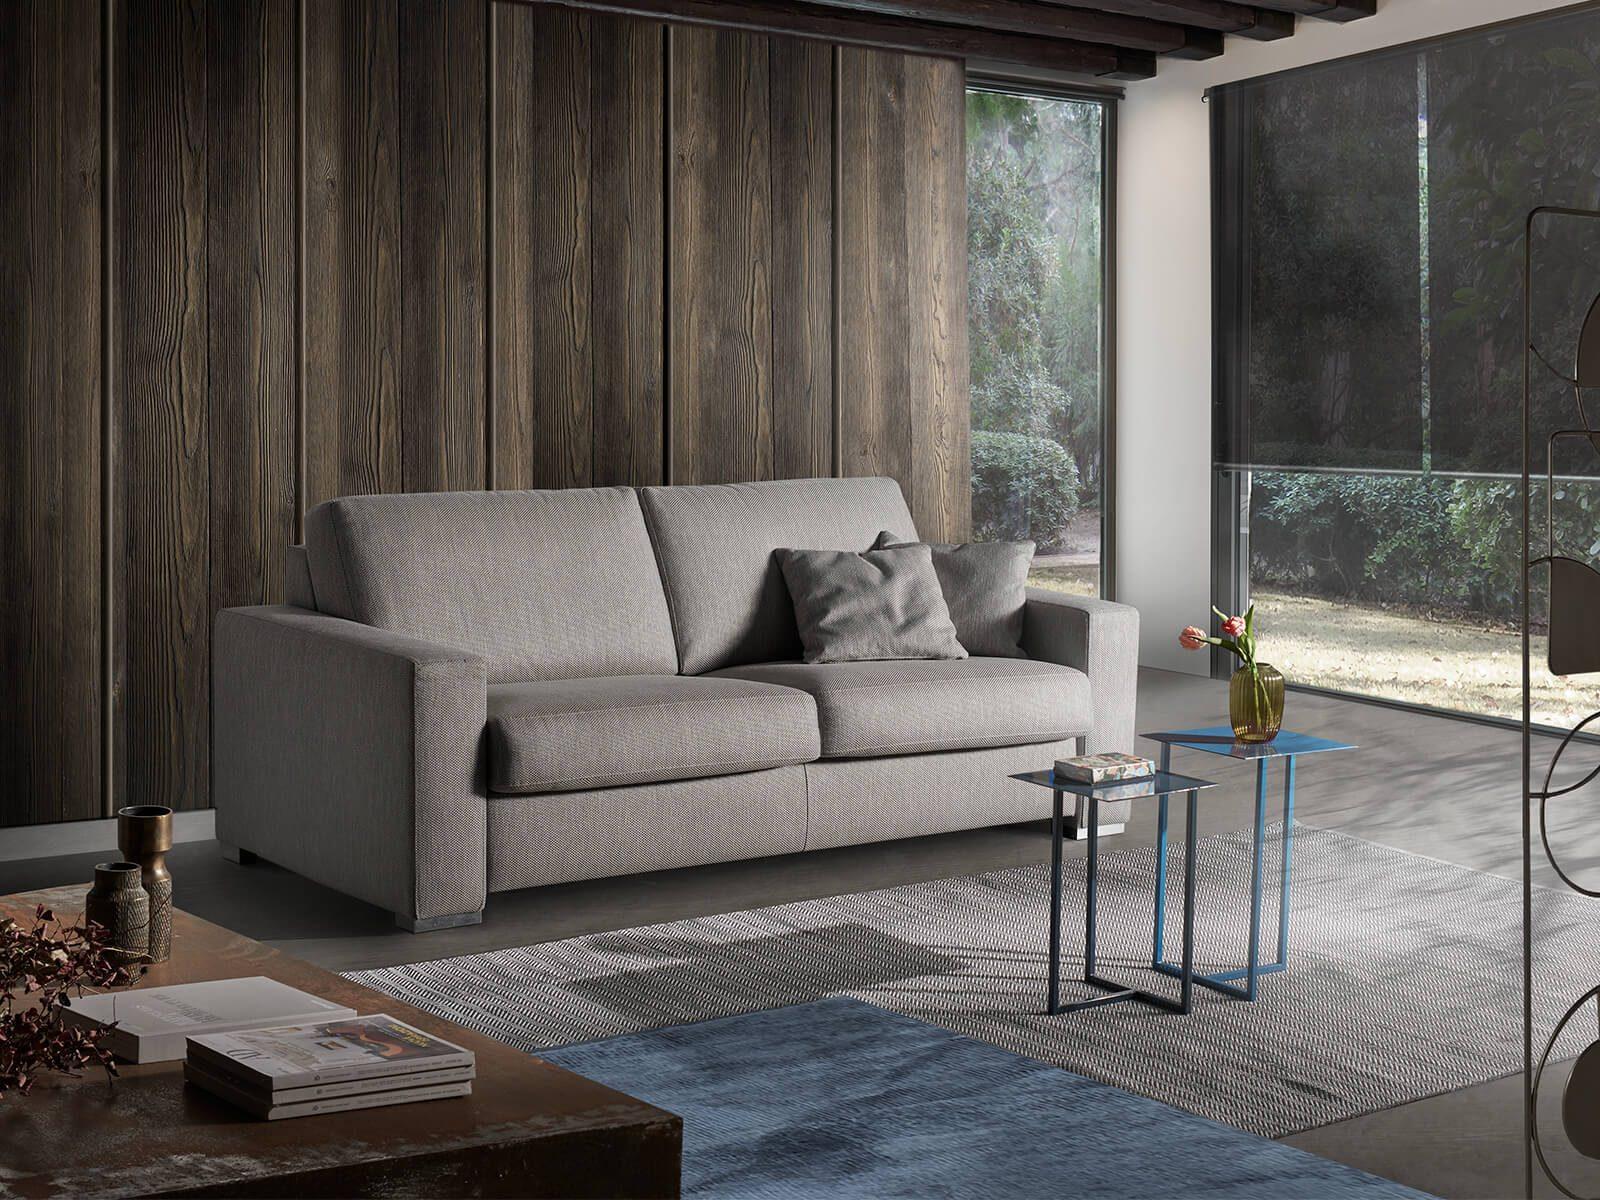 Remarkable Sofa Beds Fiore Vitarelax Frankydiablos Diy Chair Ideas Frankydiabloscom